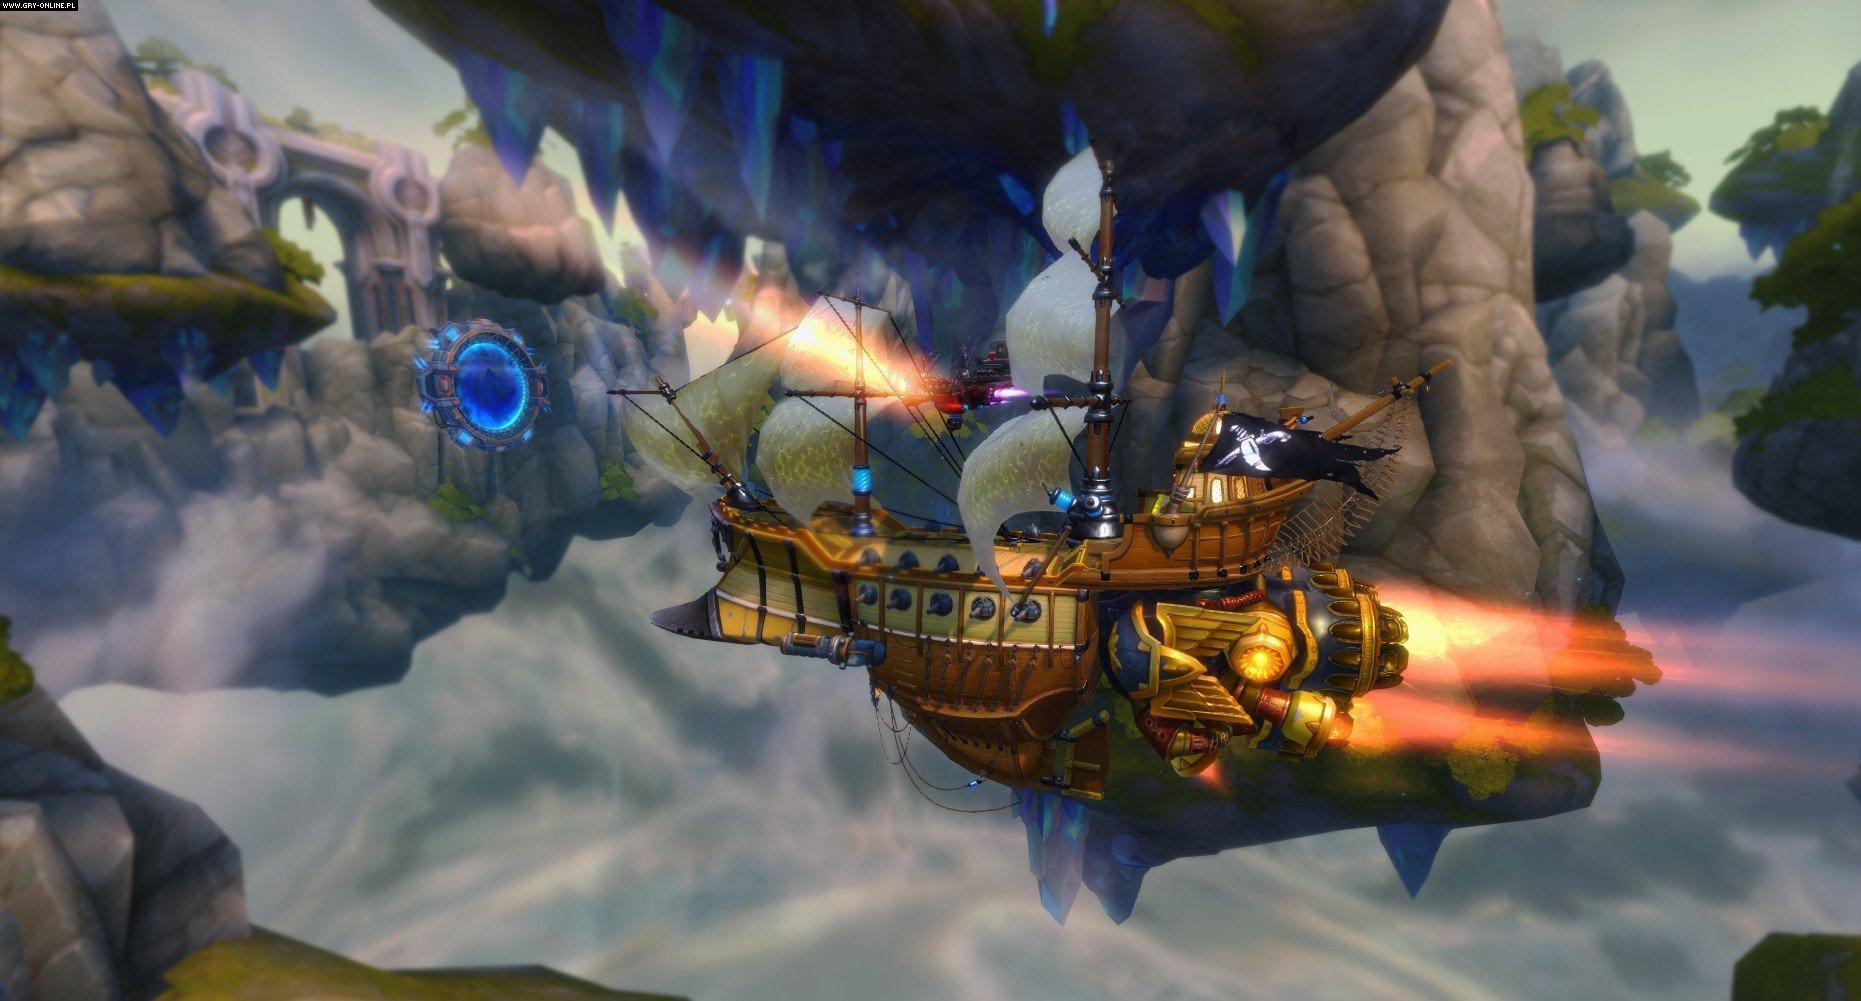 Cloud Pirates PC Games Image 1/12, Allods Team, My.com